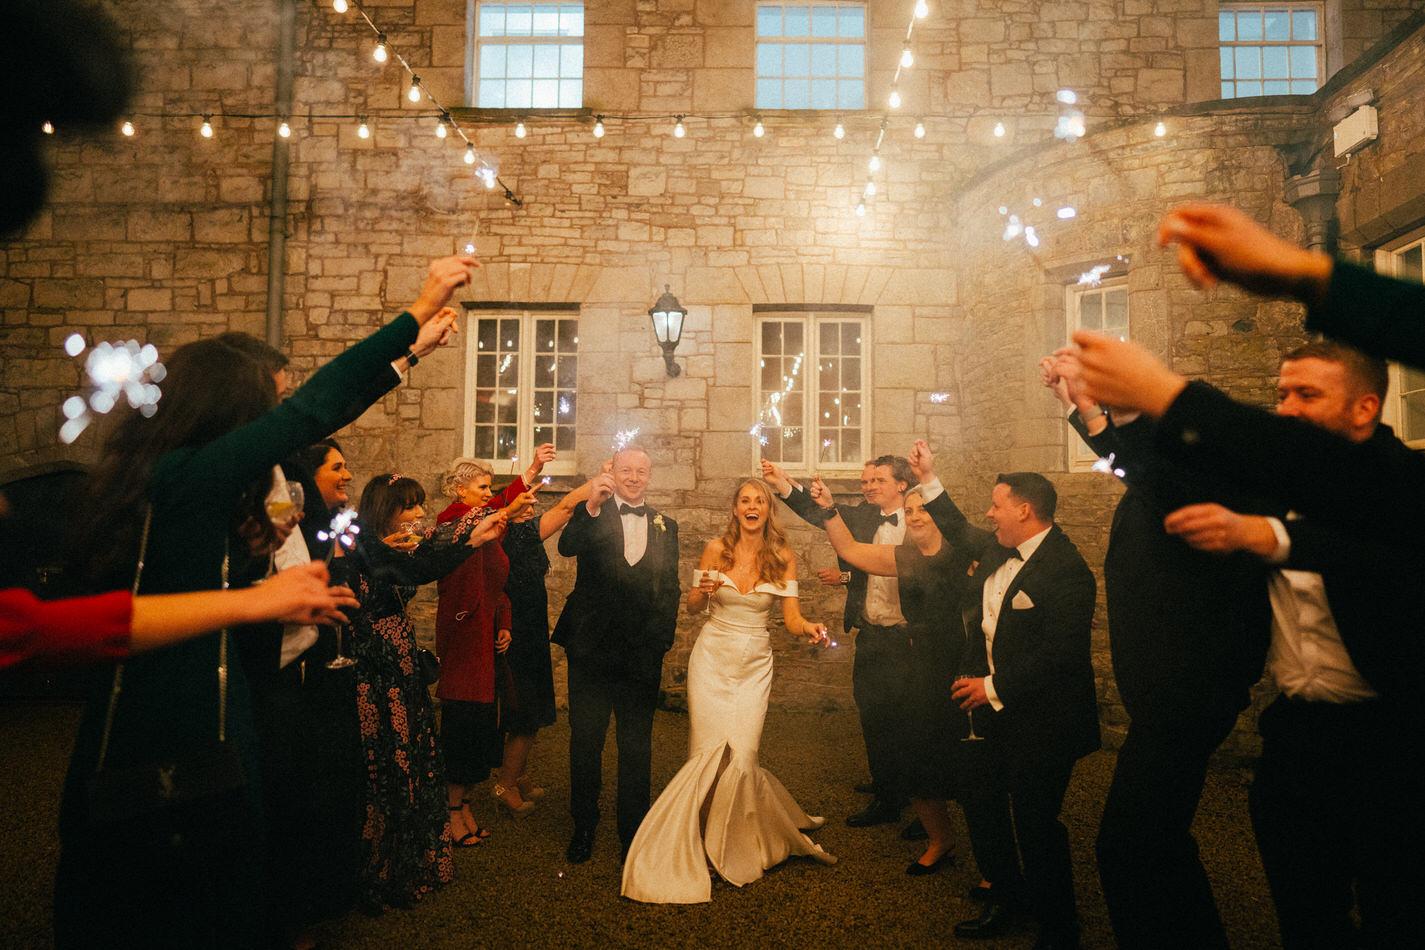 Castle-wedding-ireland-photos- 0342 253